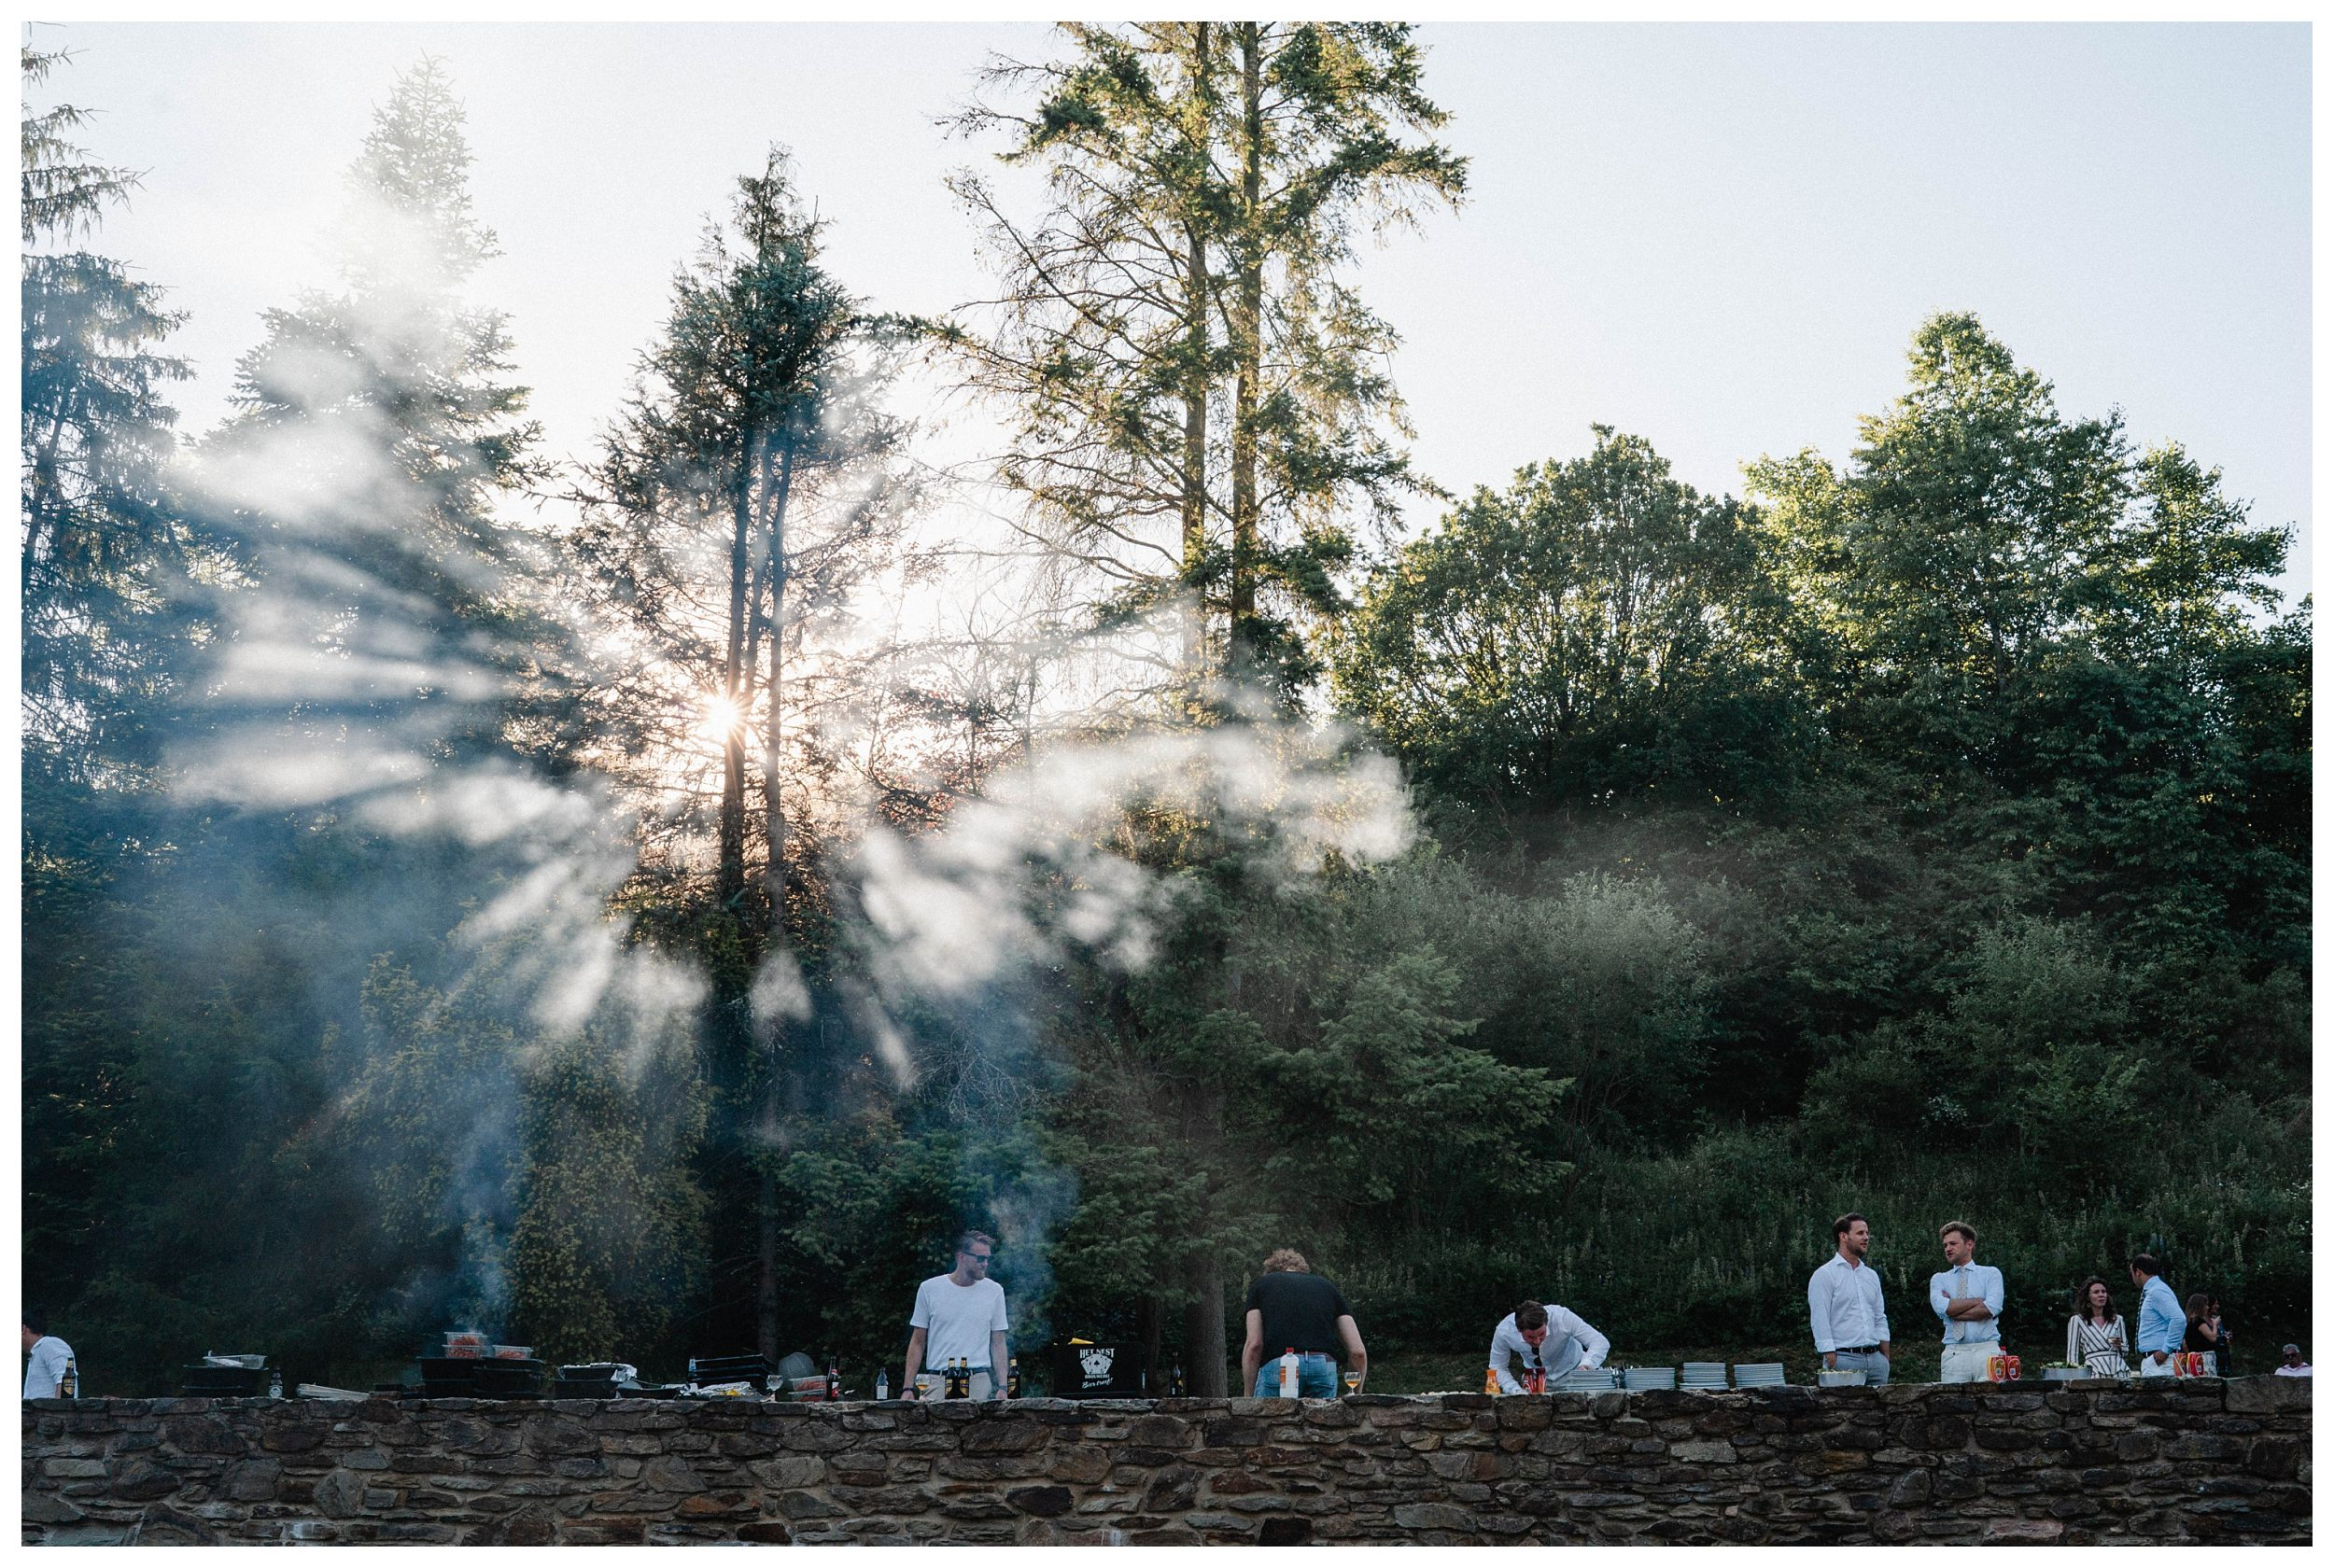 huwelijksfotograaf bruidsfotograaf destinationwedding huwelijksfotografie in ardennen nederland (78).jpg